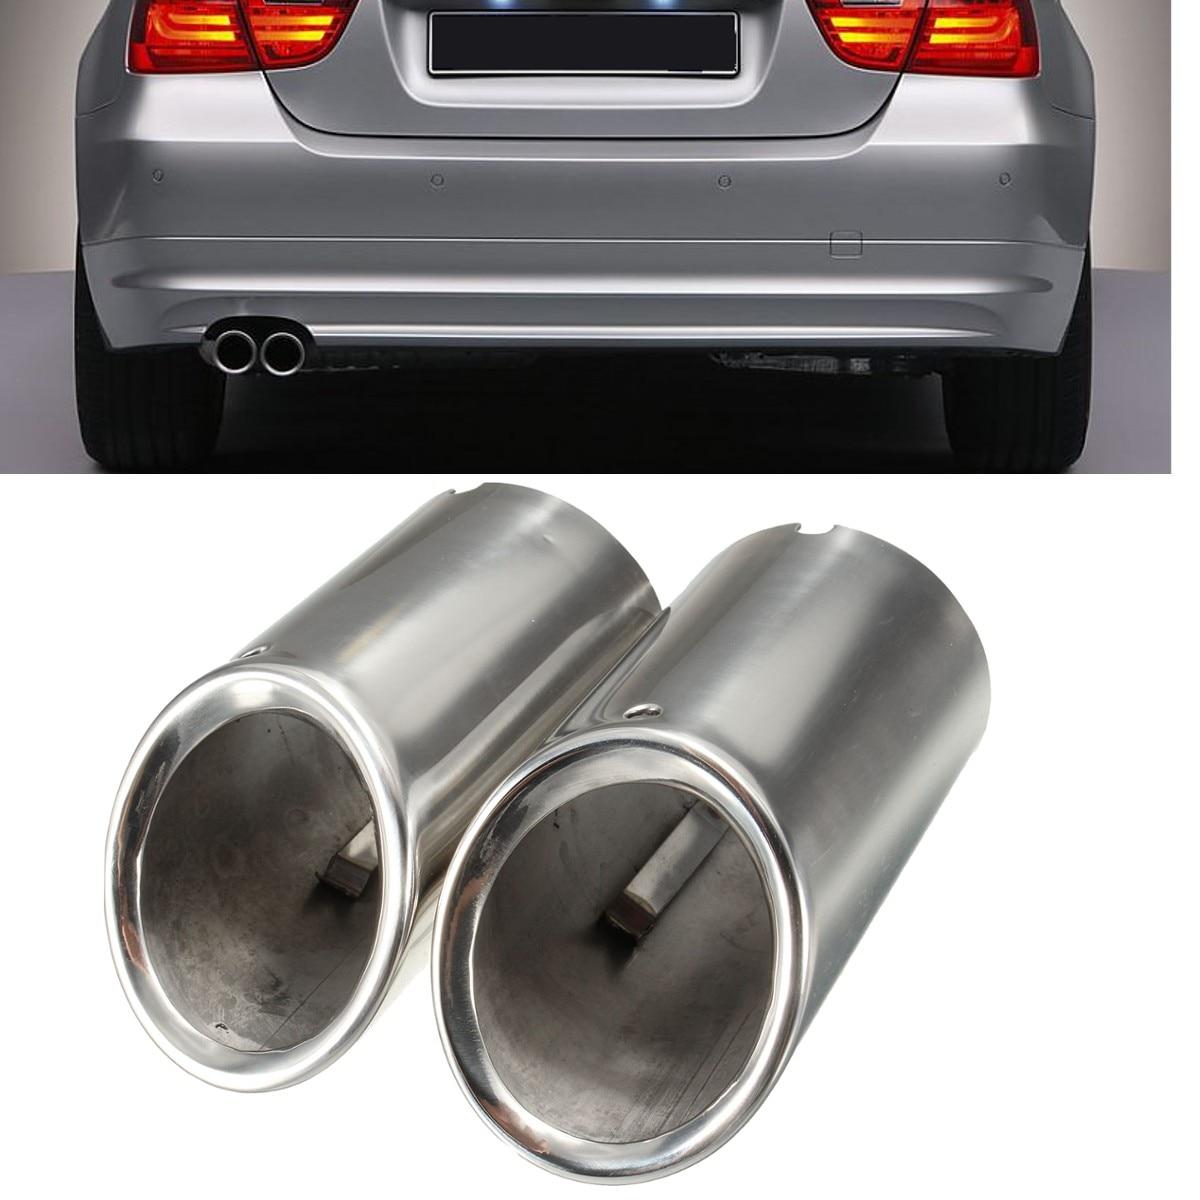 2 Stücke Set Schalldämpfer Auspuff Endrohr Tipp Chrom Für BMW E90 E92 325i 328i 3 Serie 2006-2010